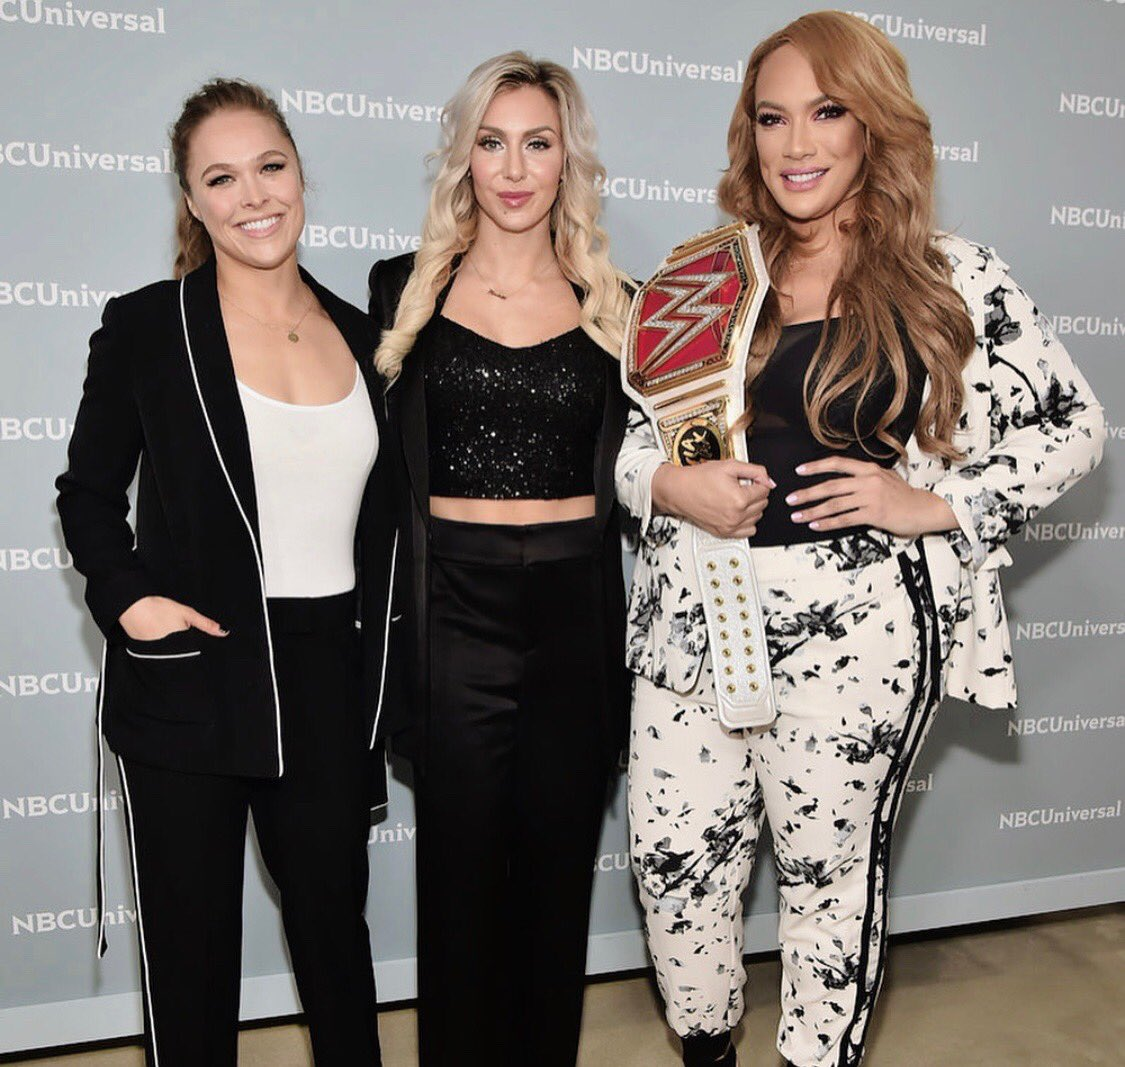 The Elite Of WWE Woman's Division In NY Representing! WOOOOO! @MsCharlotteWWE @RondaRousey @NiaJaxWWE